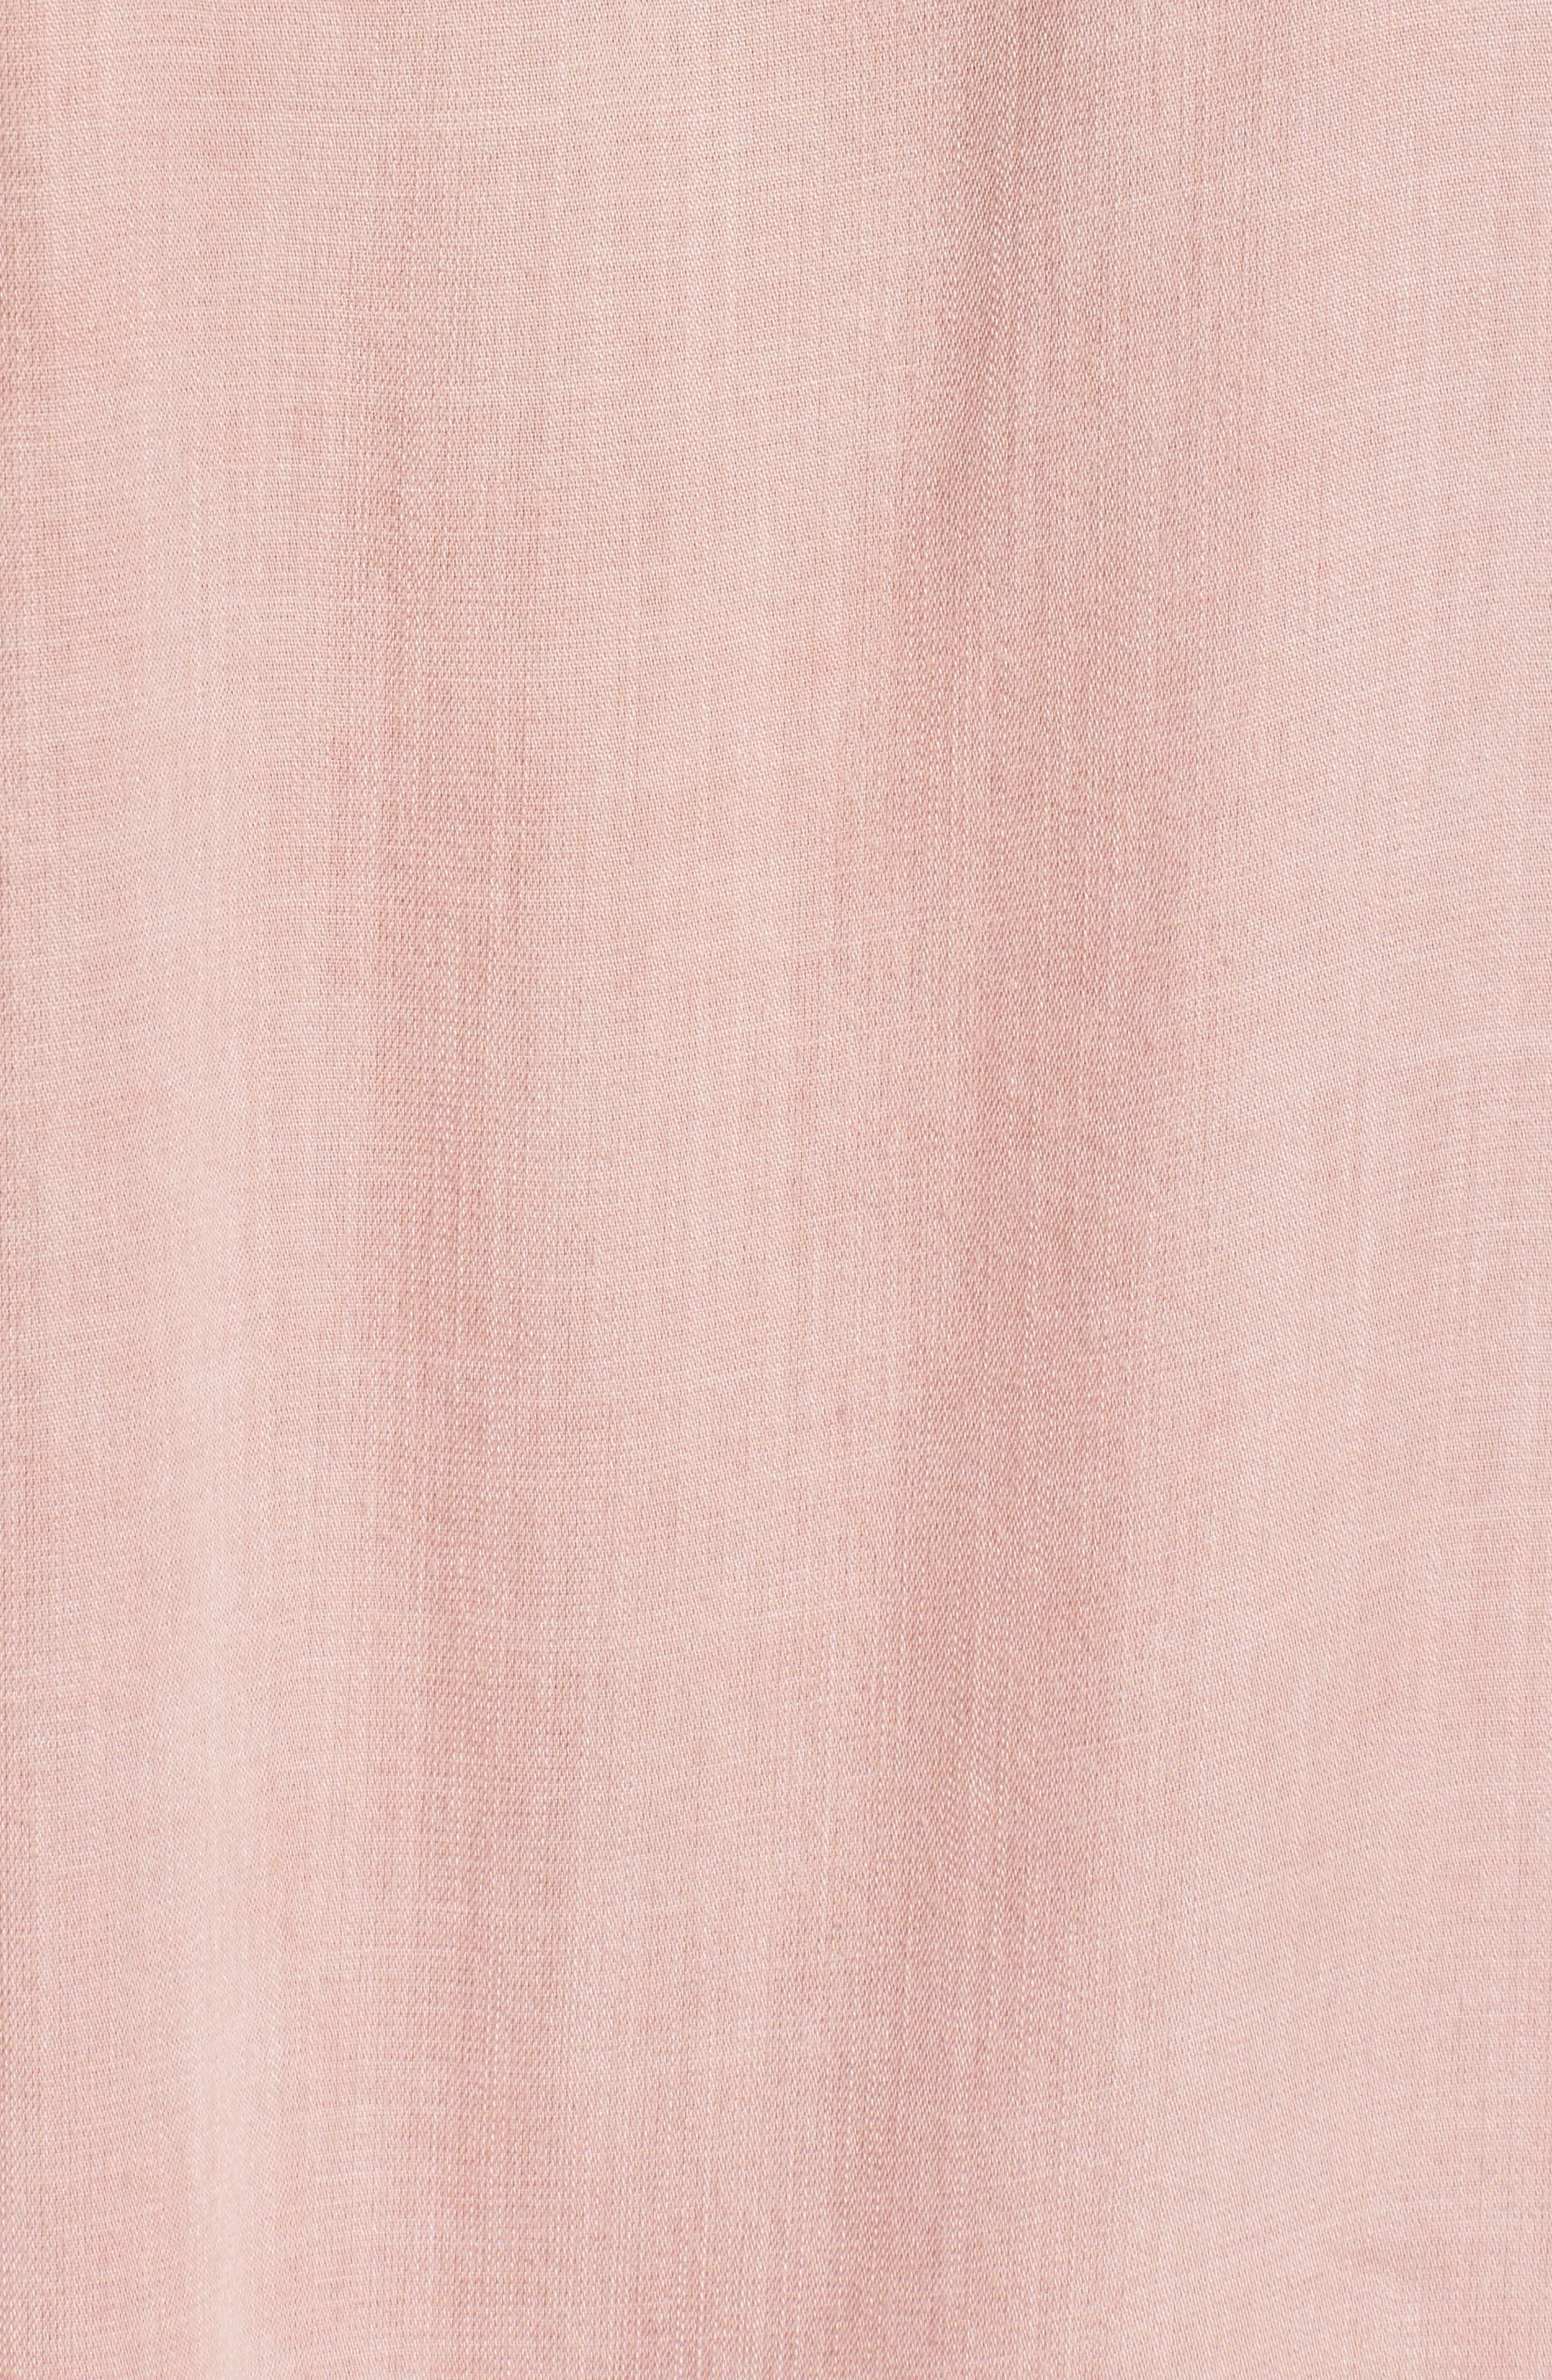 Off the Shoulder Denim Dress,                             Alternate thumbnail 5, color,                             Dusty Pink